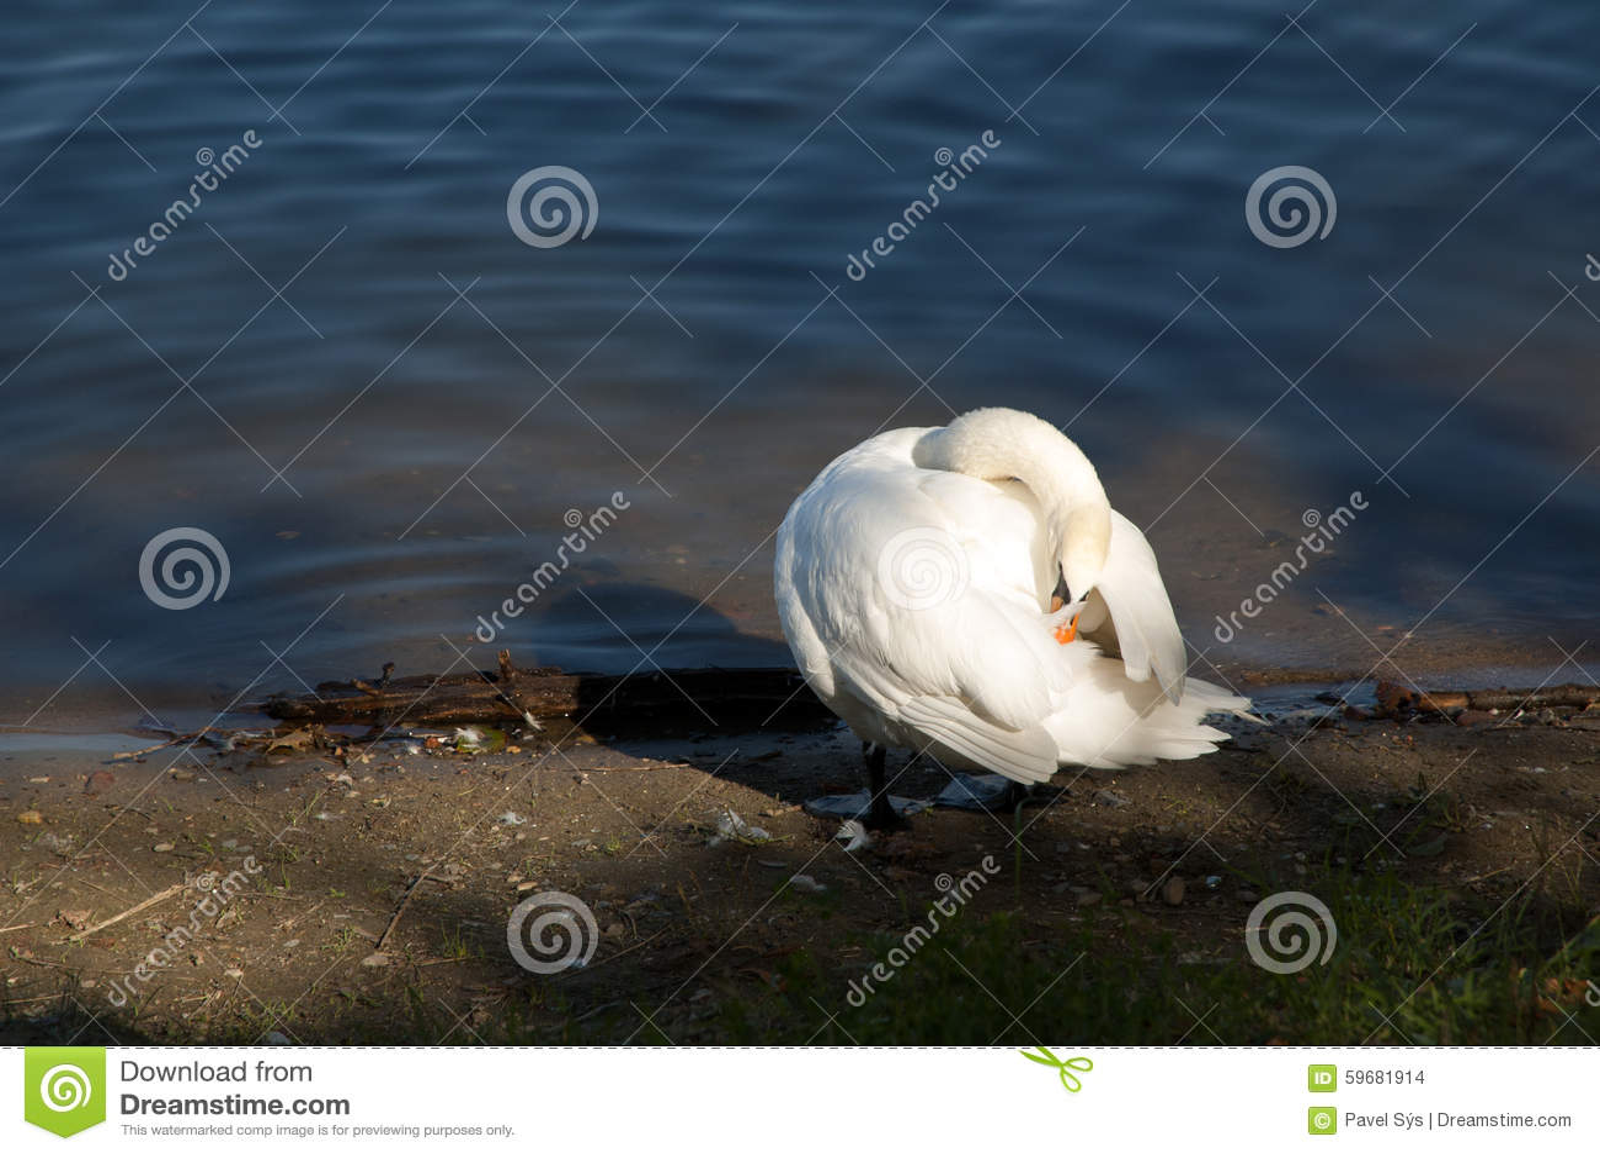 singles in swan river Swan river (suba sa awstralya, state of western australia) swan river (suba sa awstralya, state of tasmania) canada.